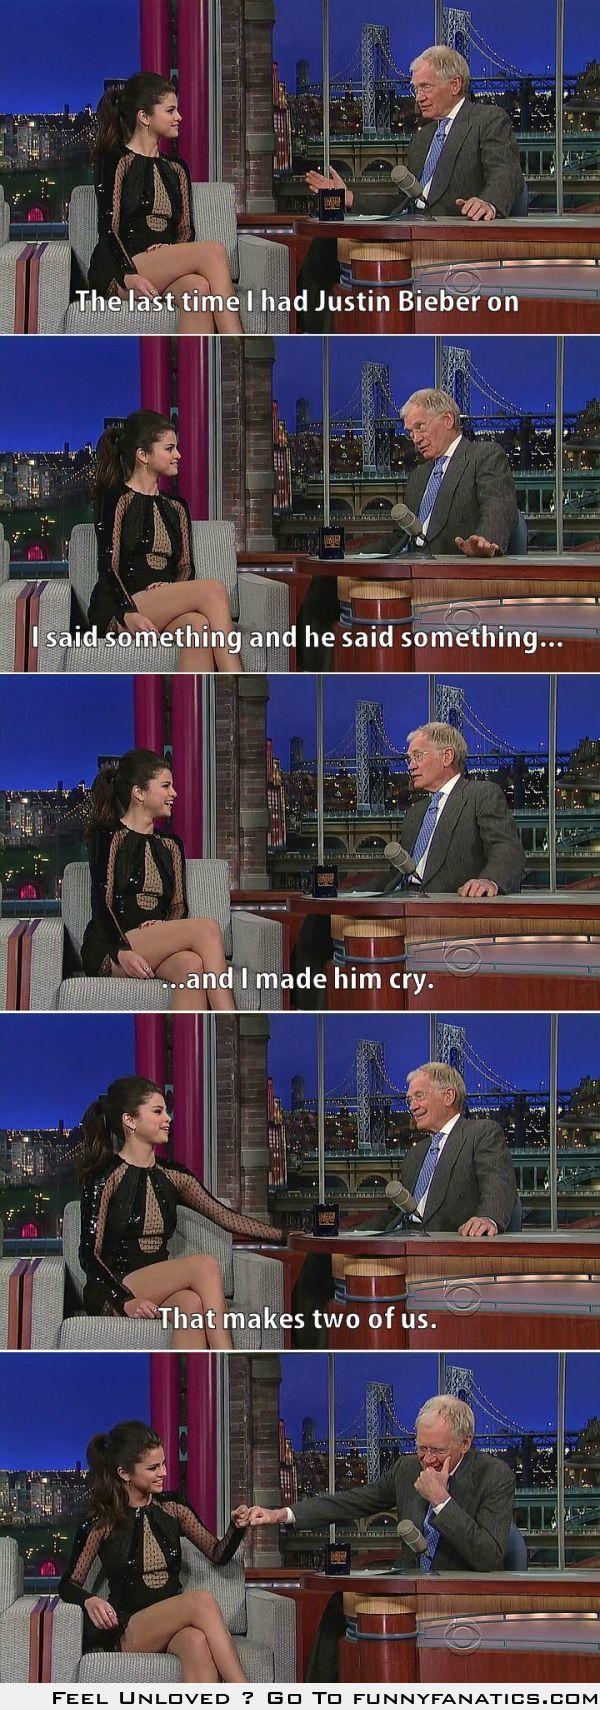 Letterman and Selena Gomez discuss Bieber